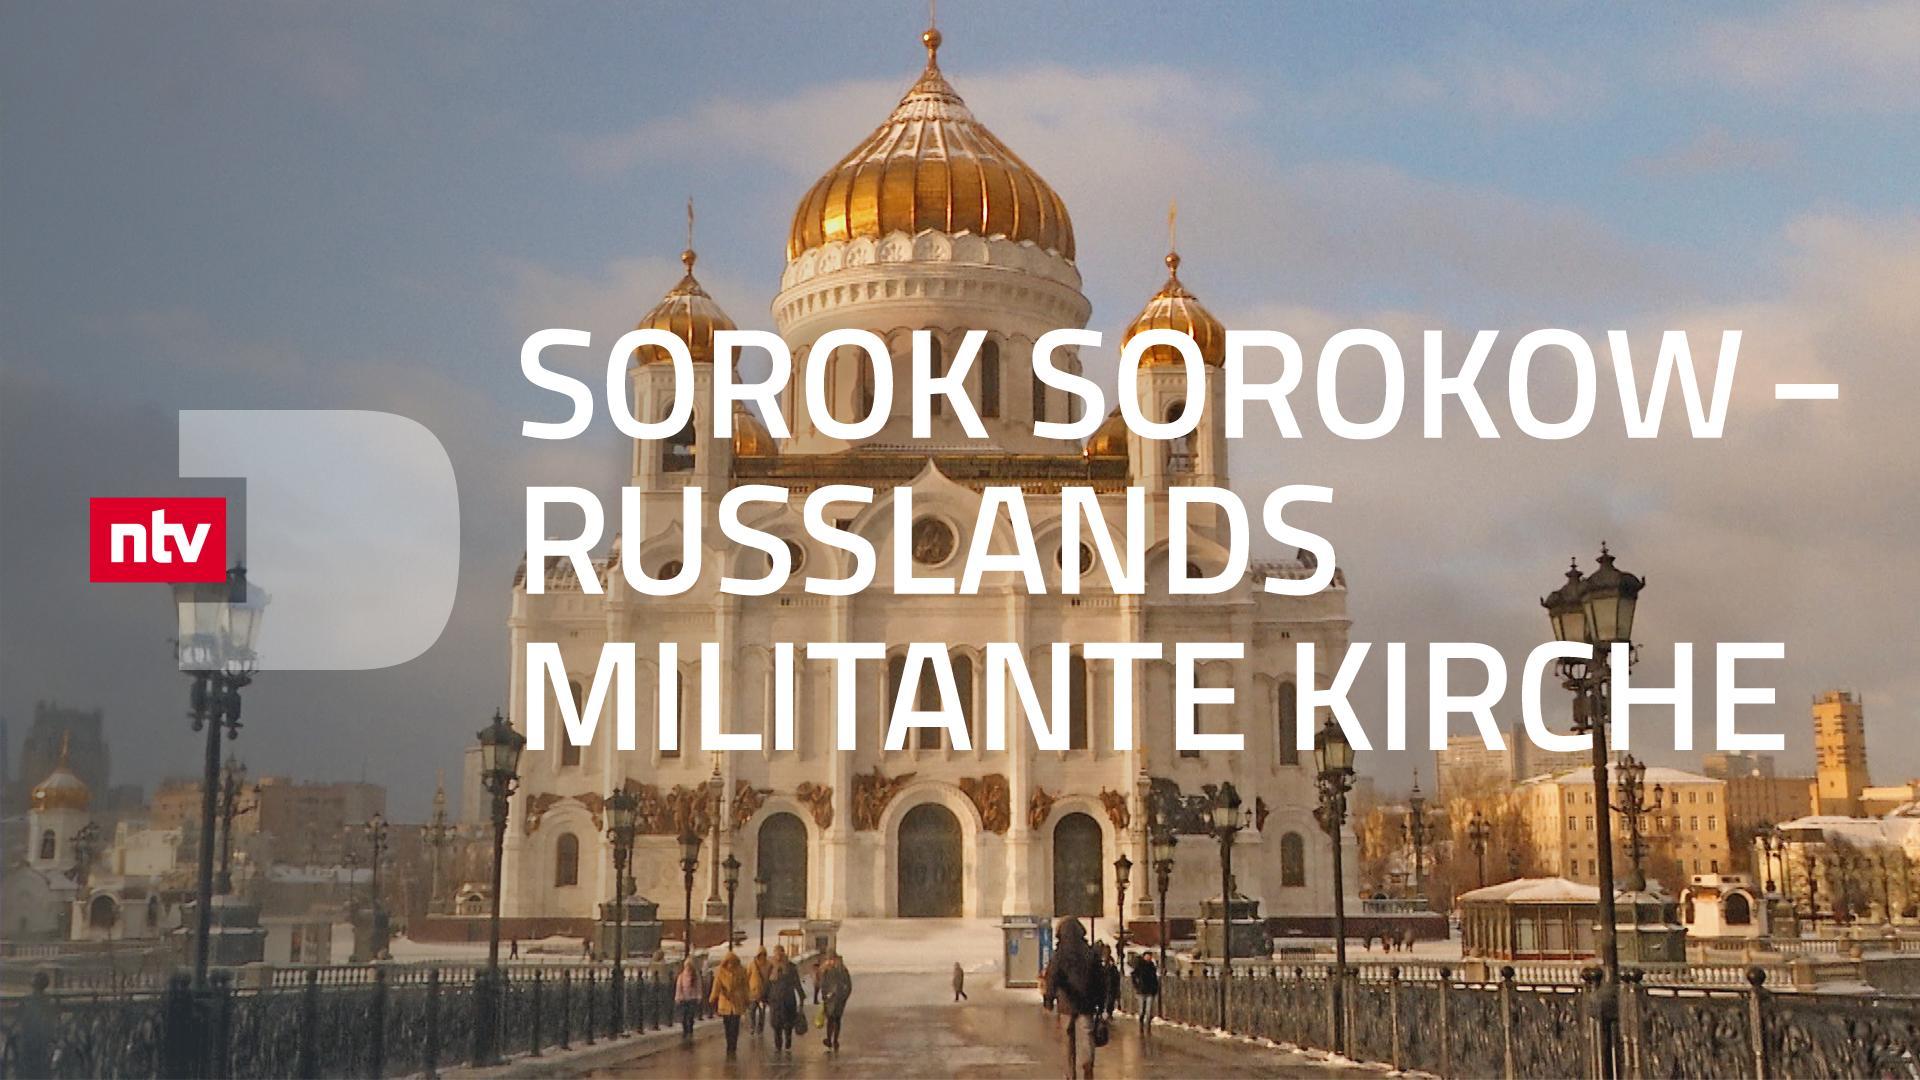 Sorok Sorokow - Russlands militante Kirche